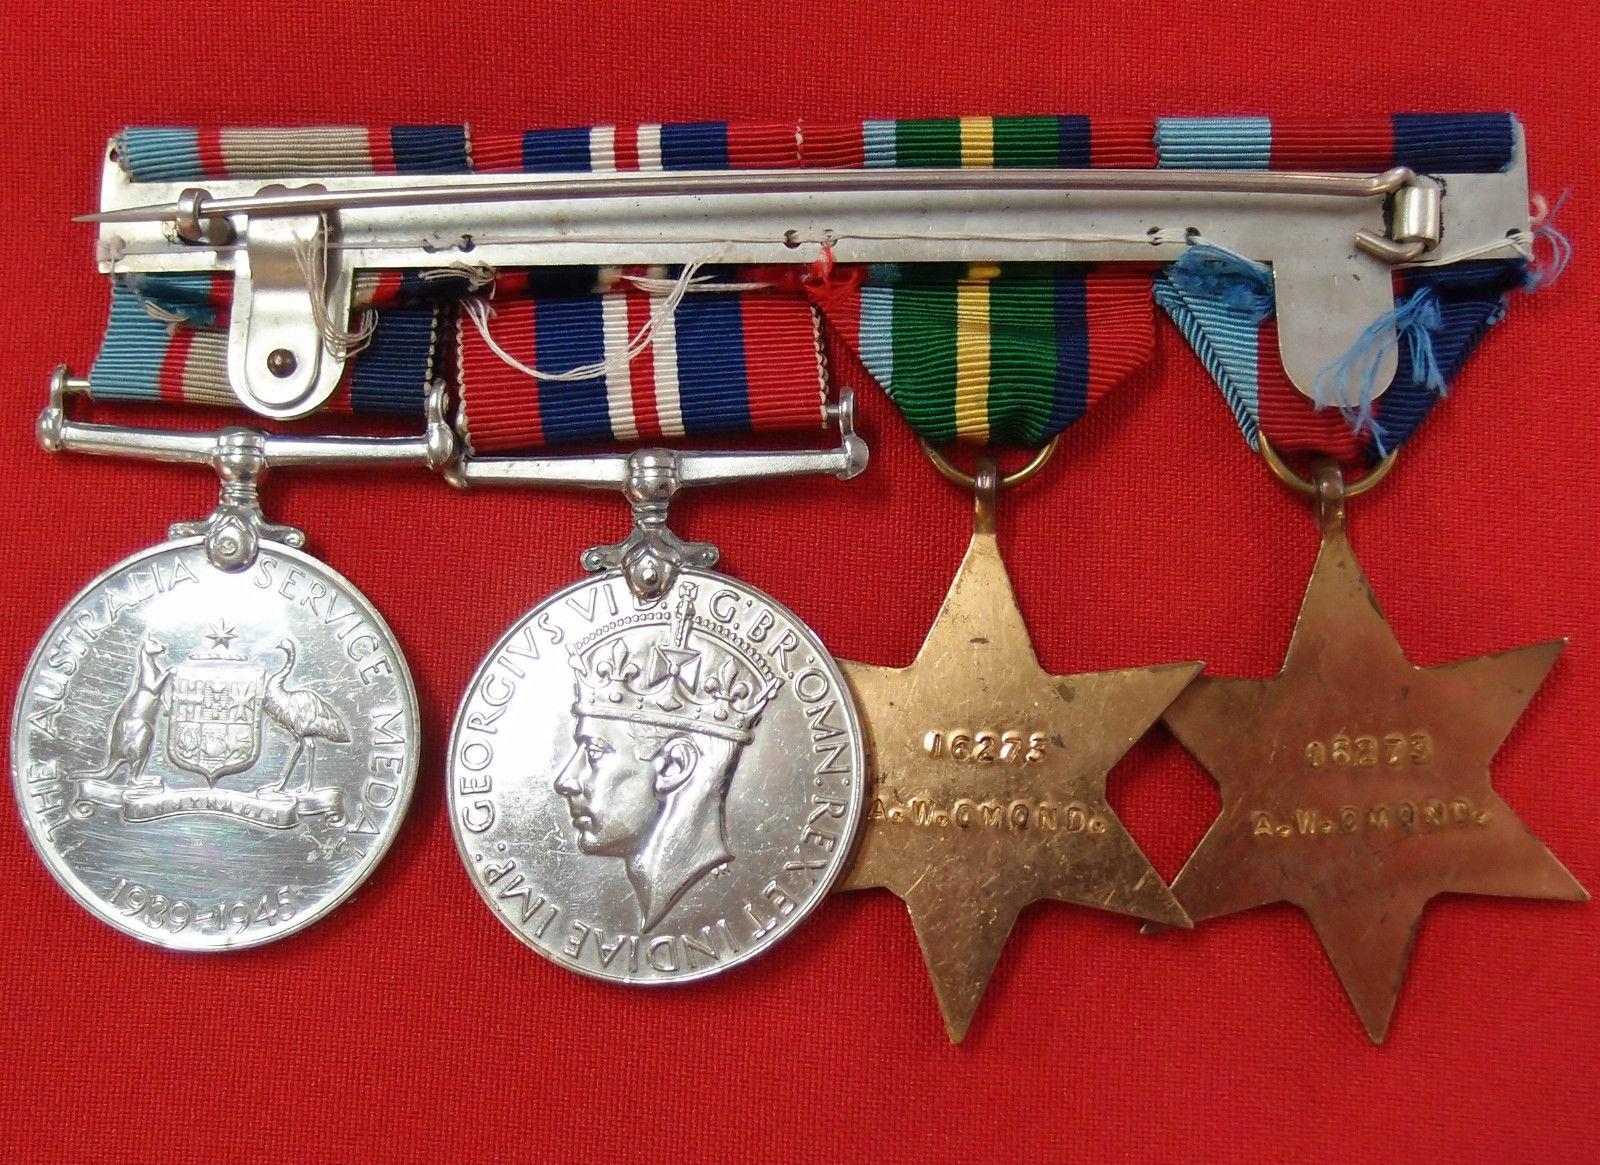 WW2 WEST AUSTRALIAN PRISONER OF WAR MEDAL GROUP RAAF THAI BURMA RAILWAY